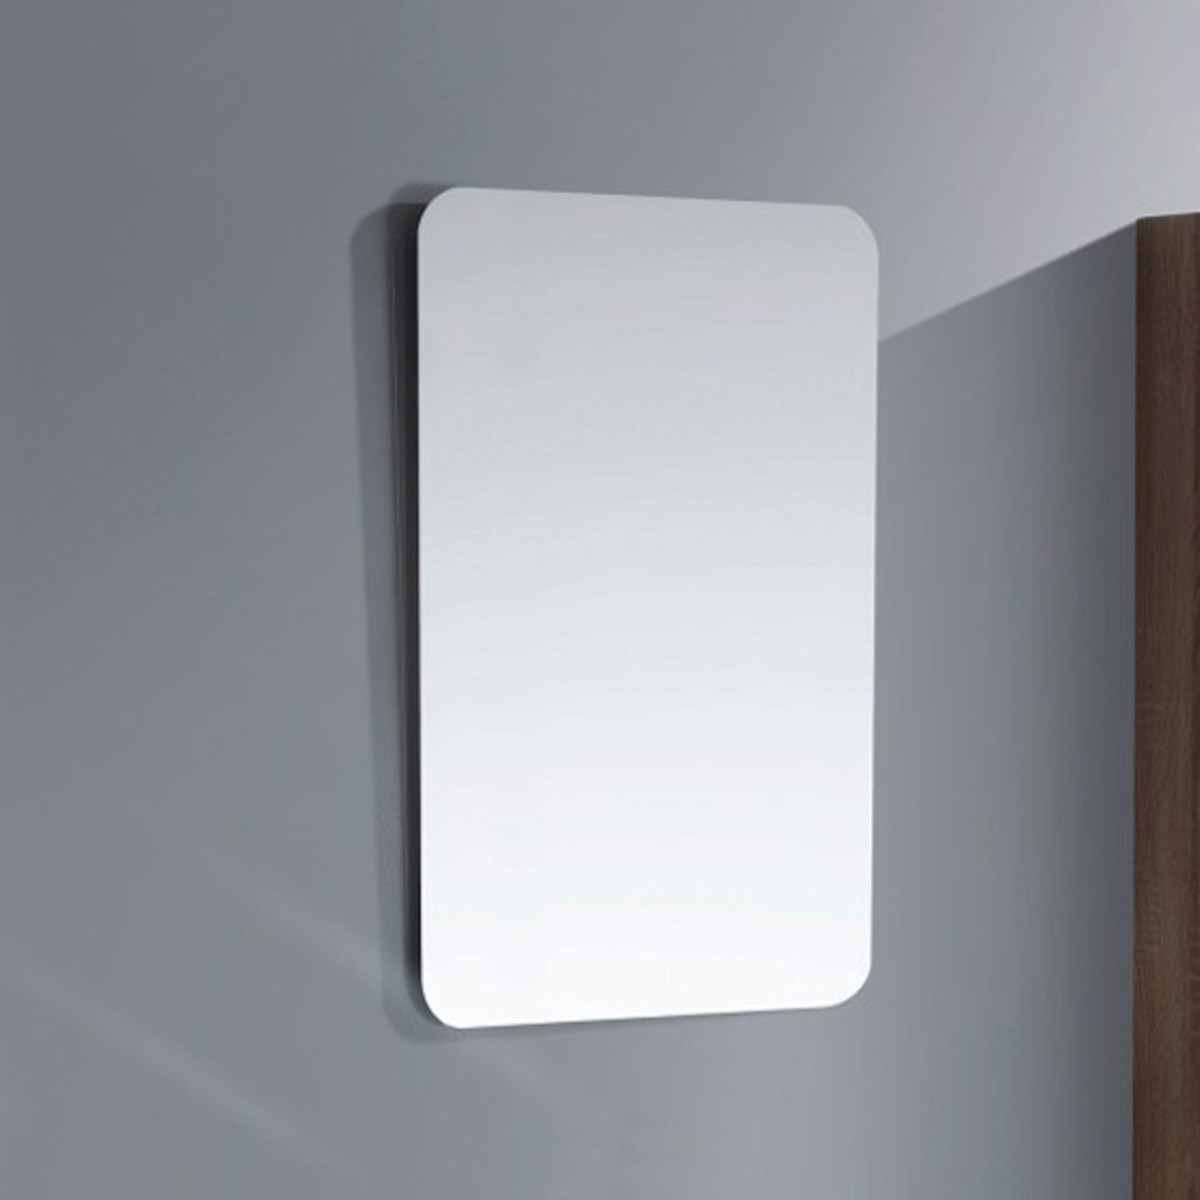 20 x 30 In. Bathroom Vanity Mirror (MYF6002-M)